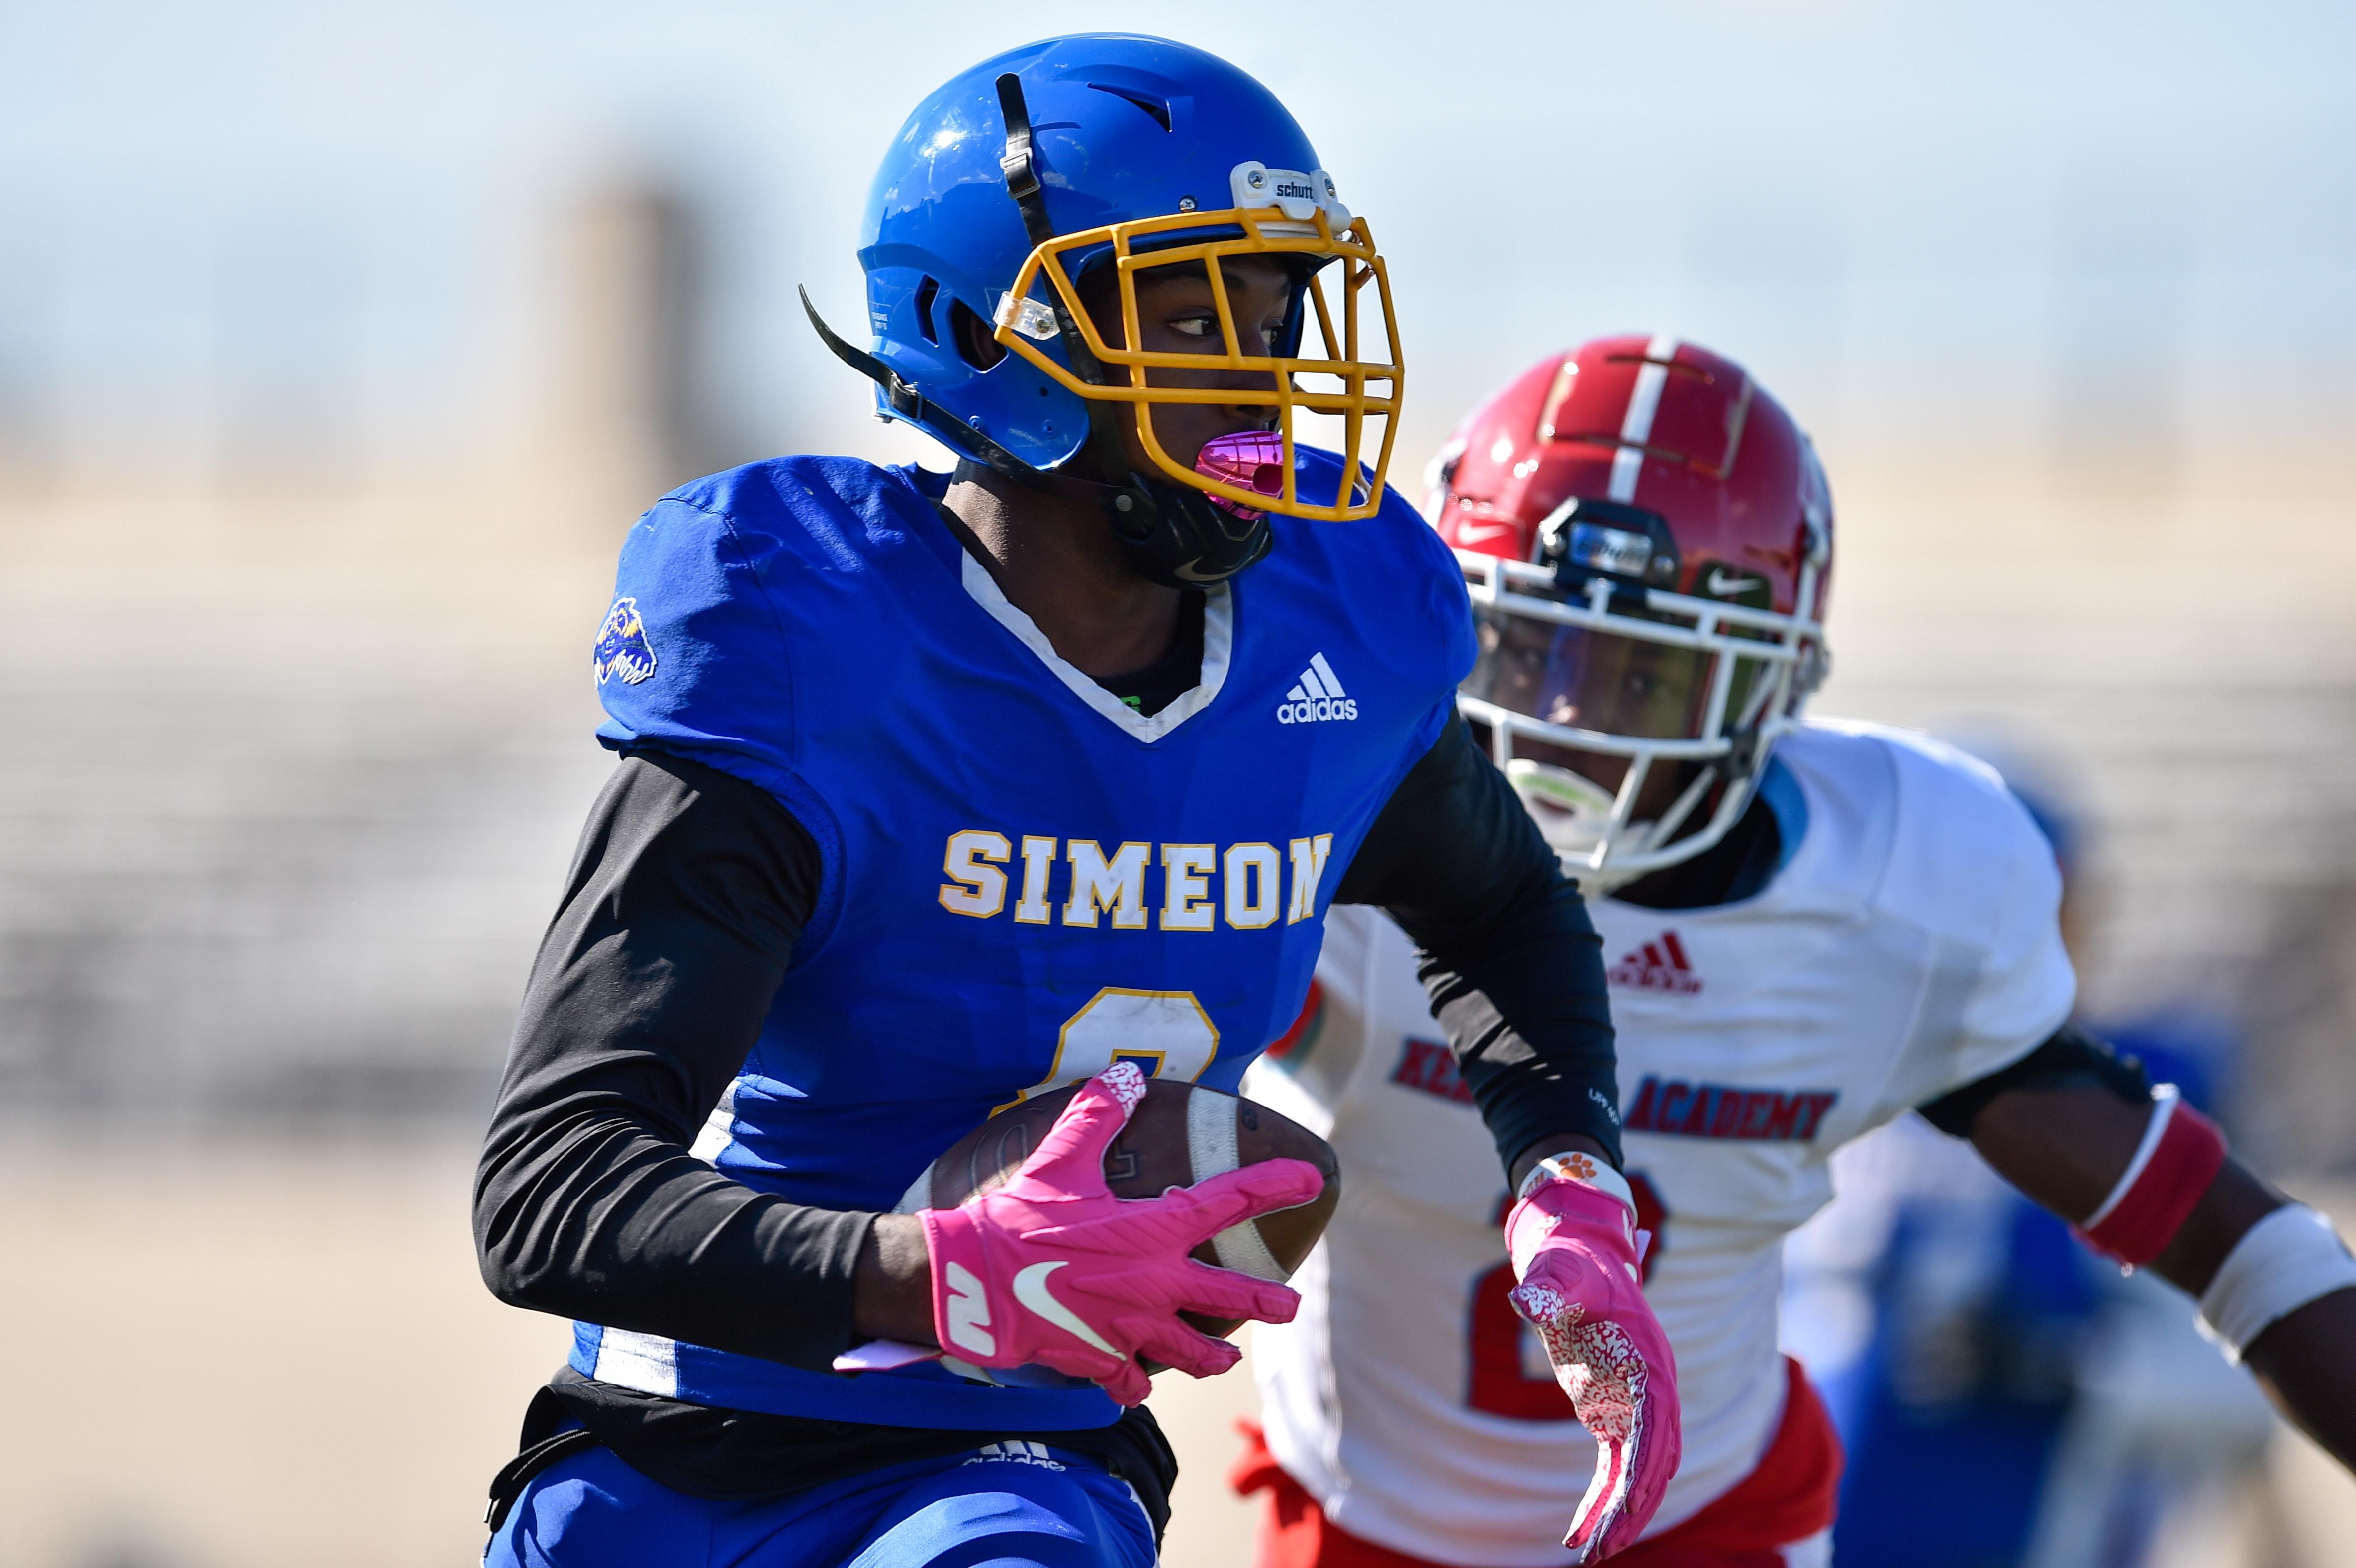 Simeon's Malik Elzy (8) runs the ball against Kenwood.